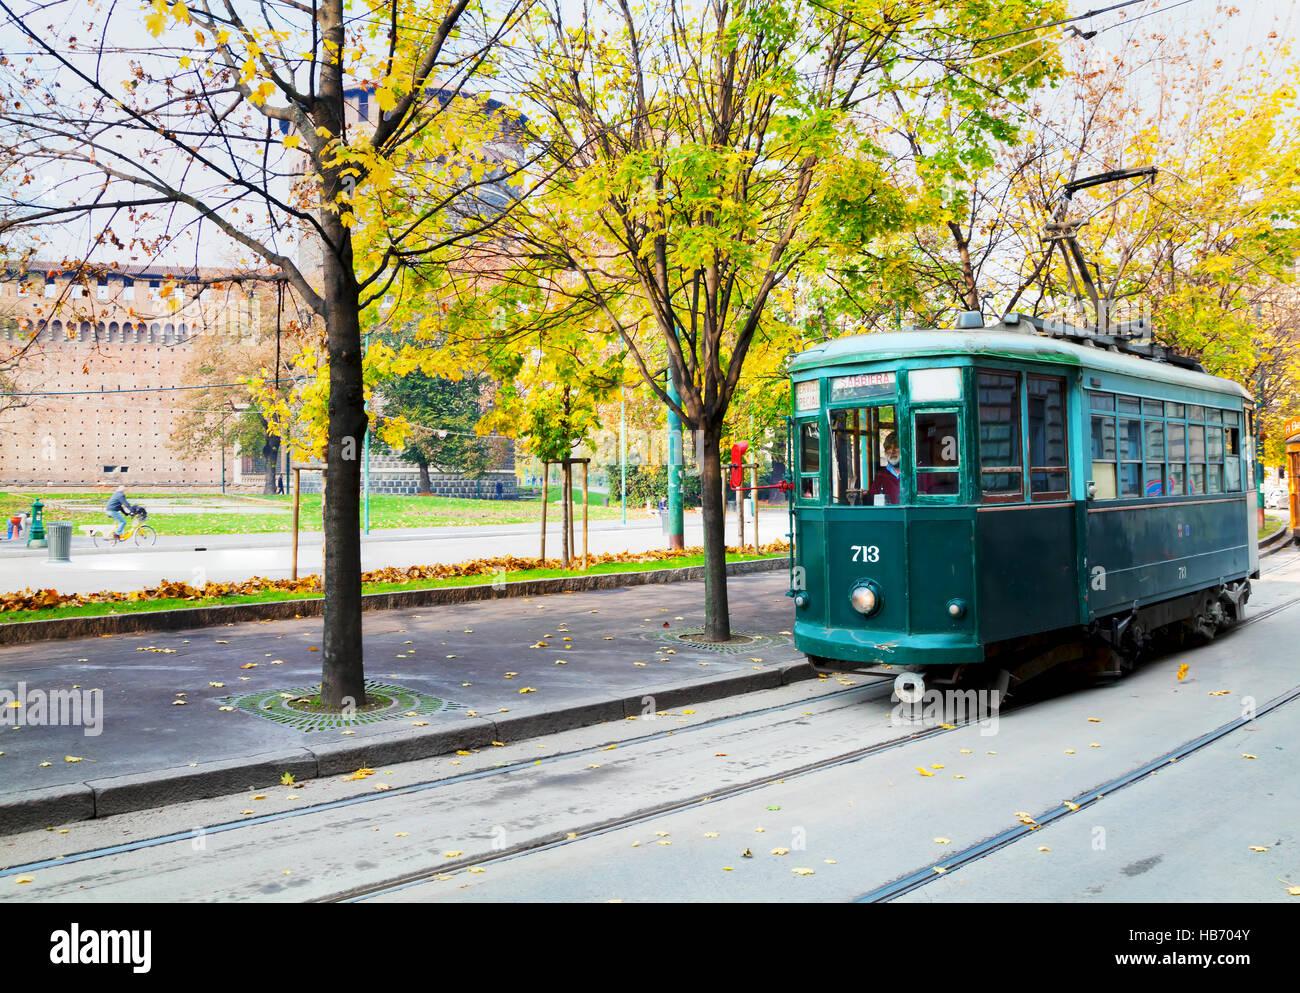 Old tram in Milano, Italy - Stock Image